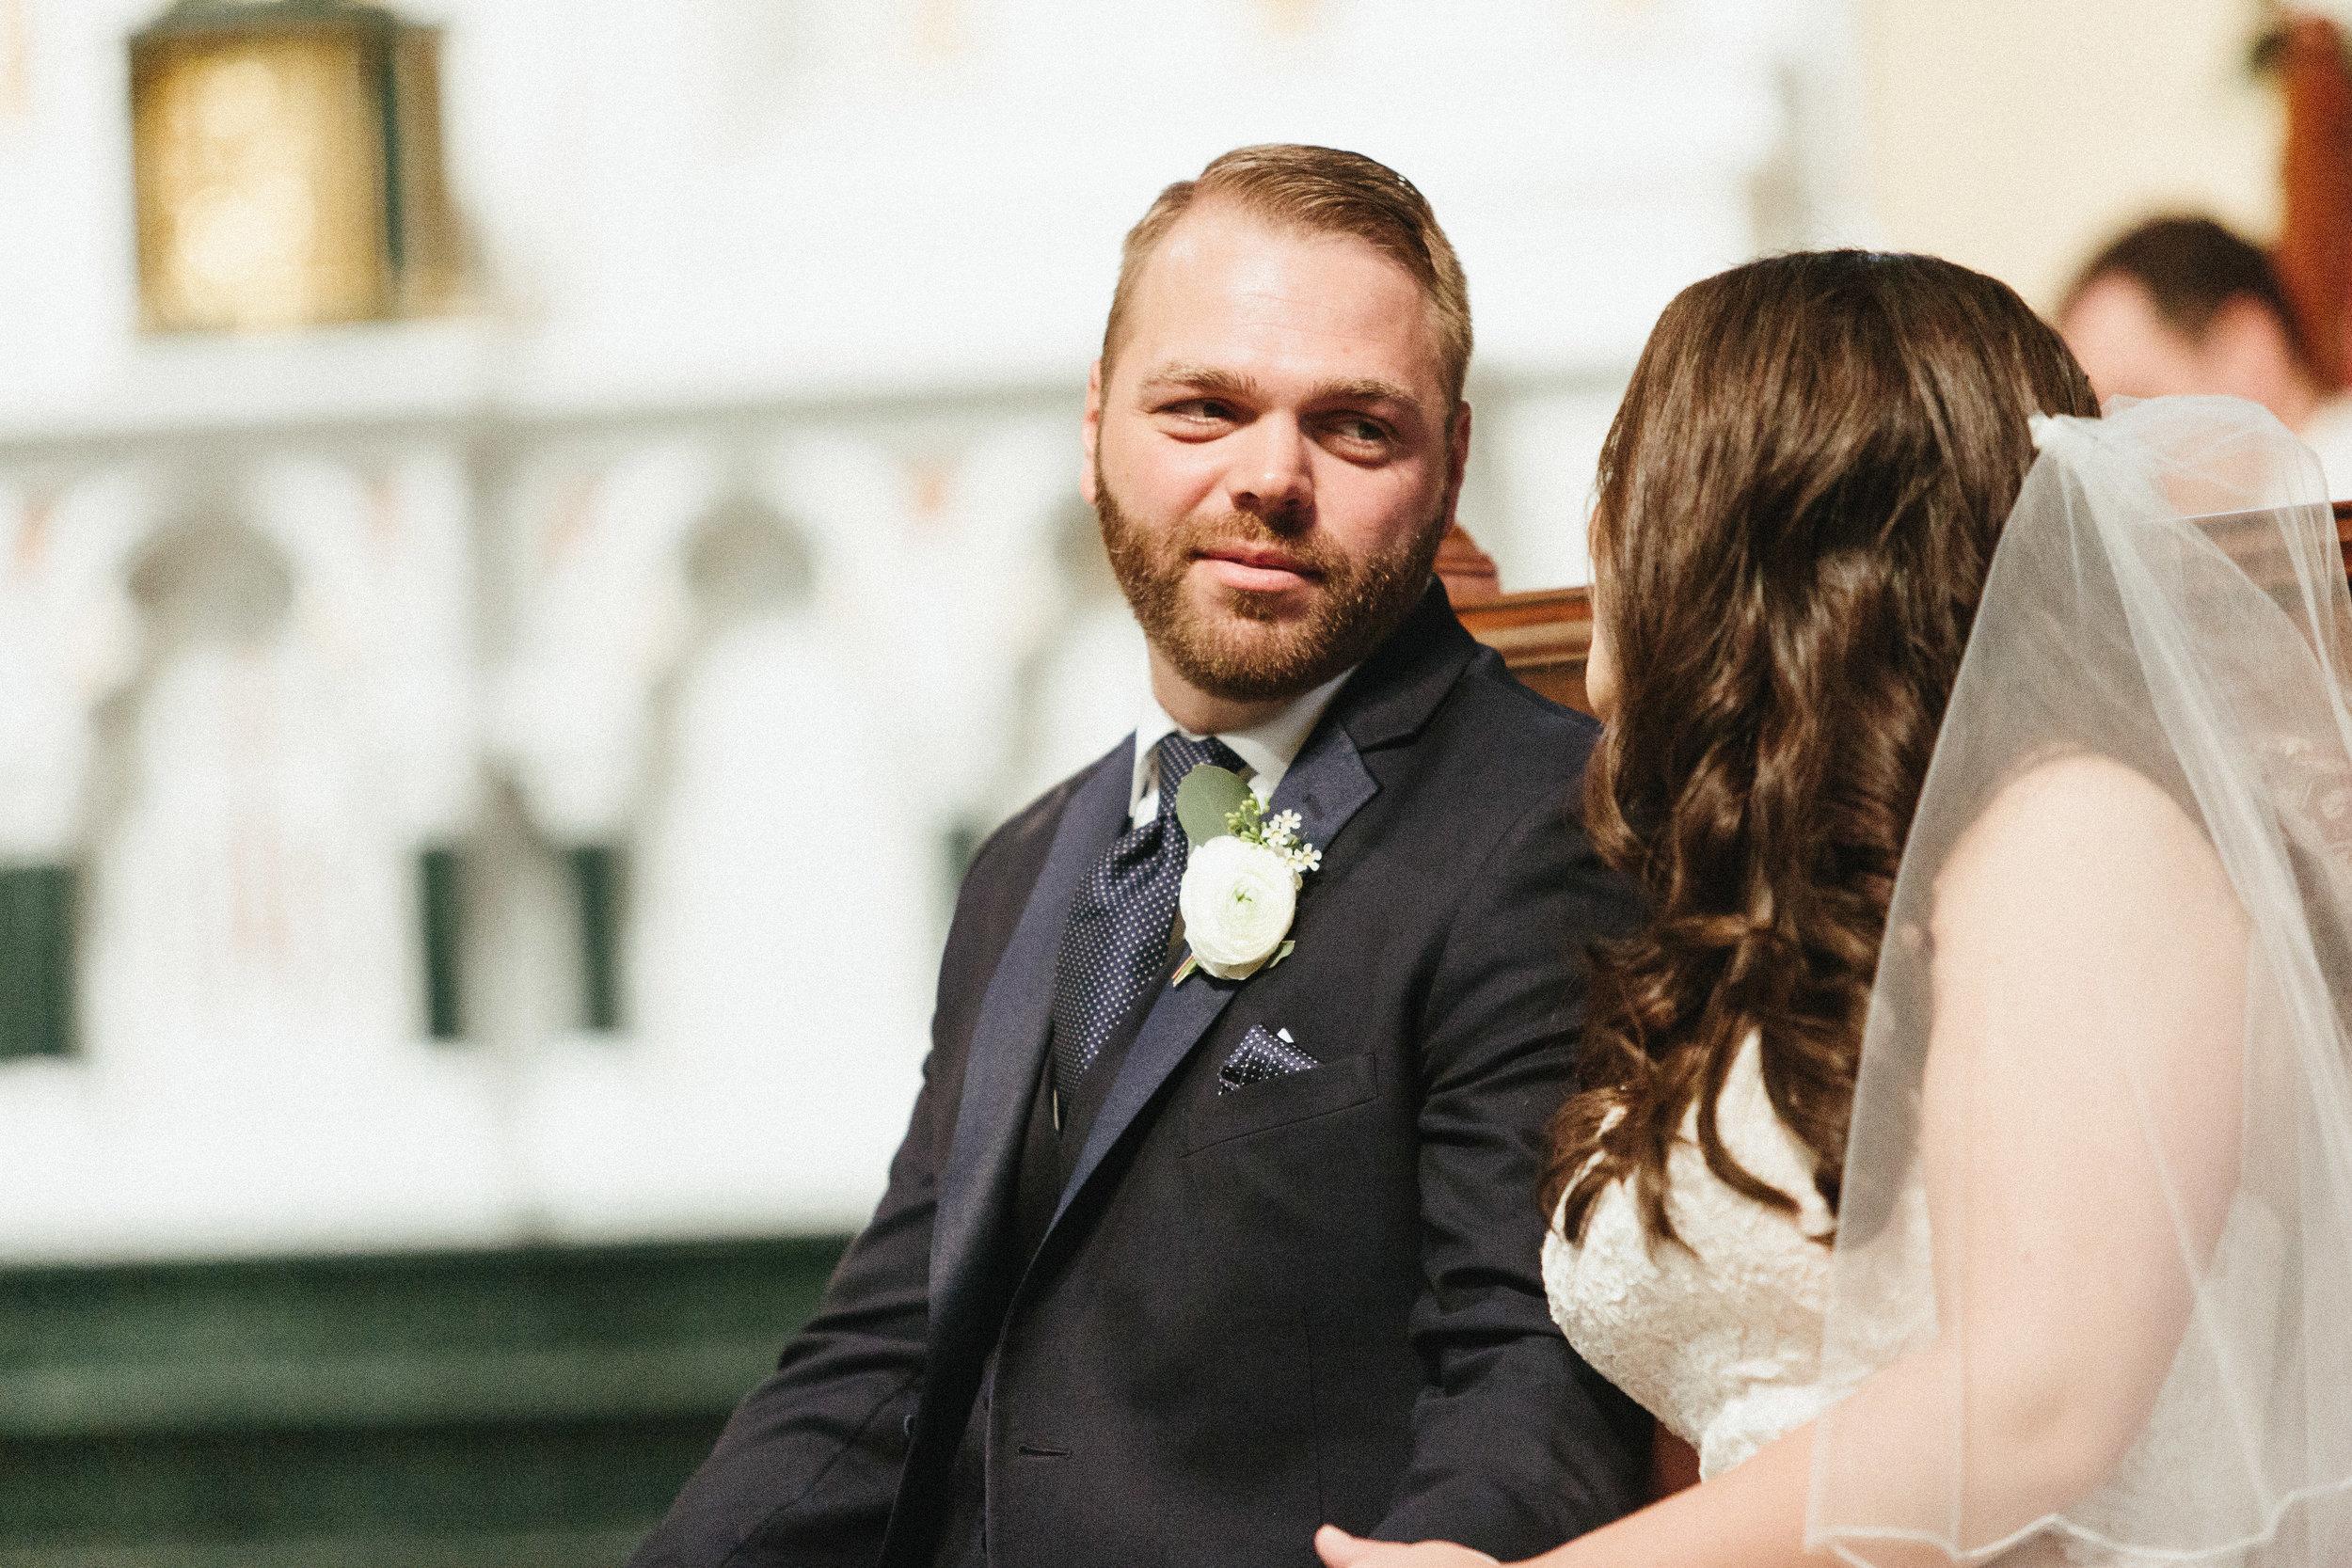 roswell_st_peter_chanel_catholic_avalon_hotel_alpharetta_wedding-1480.jpg